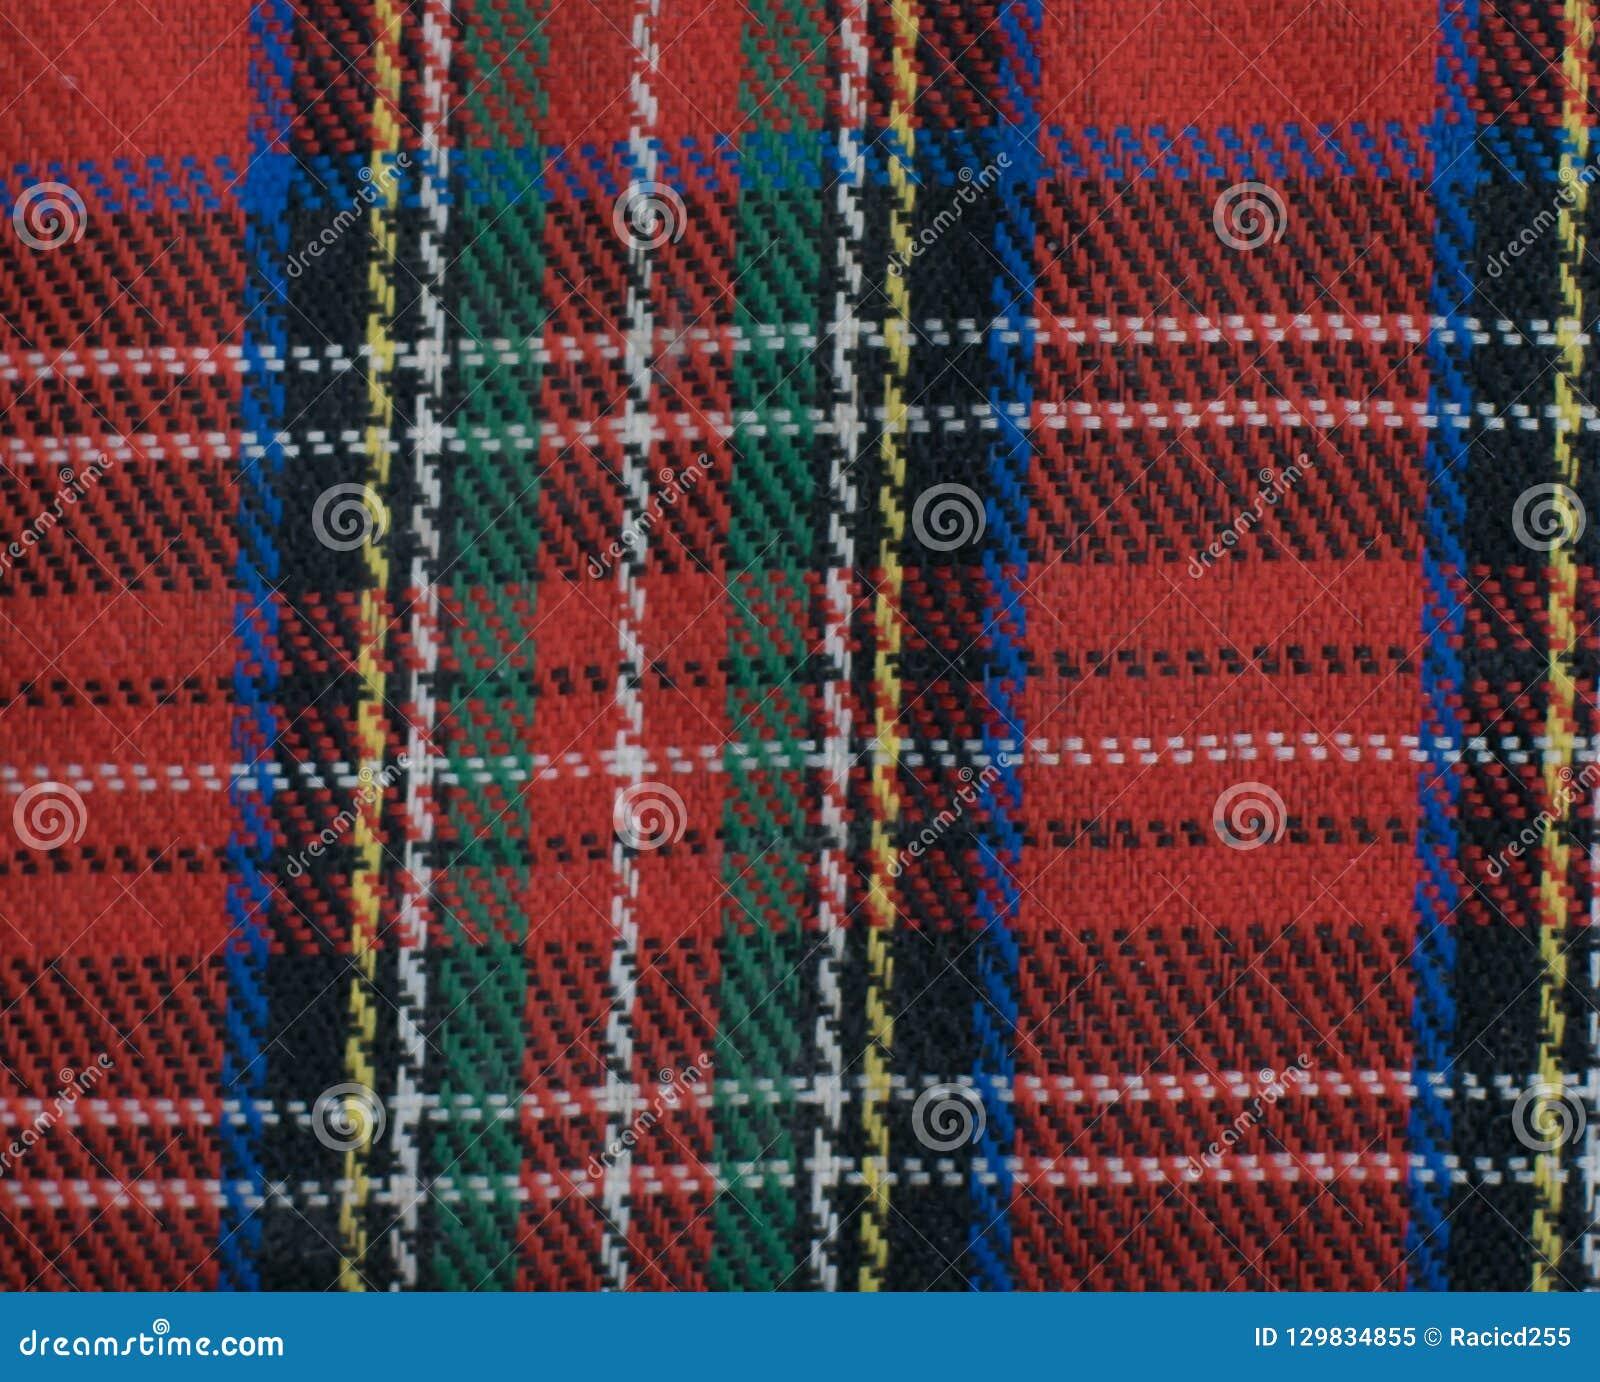 Royal Stewart Tartan. Scotland, Wallpaper. Stock Image